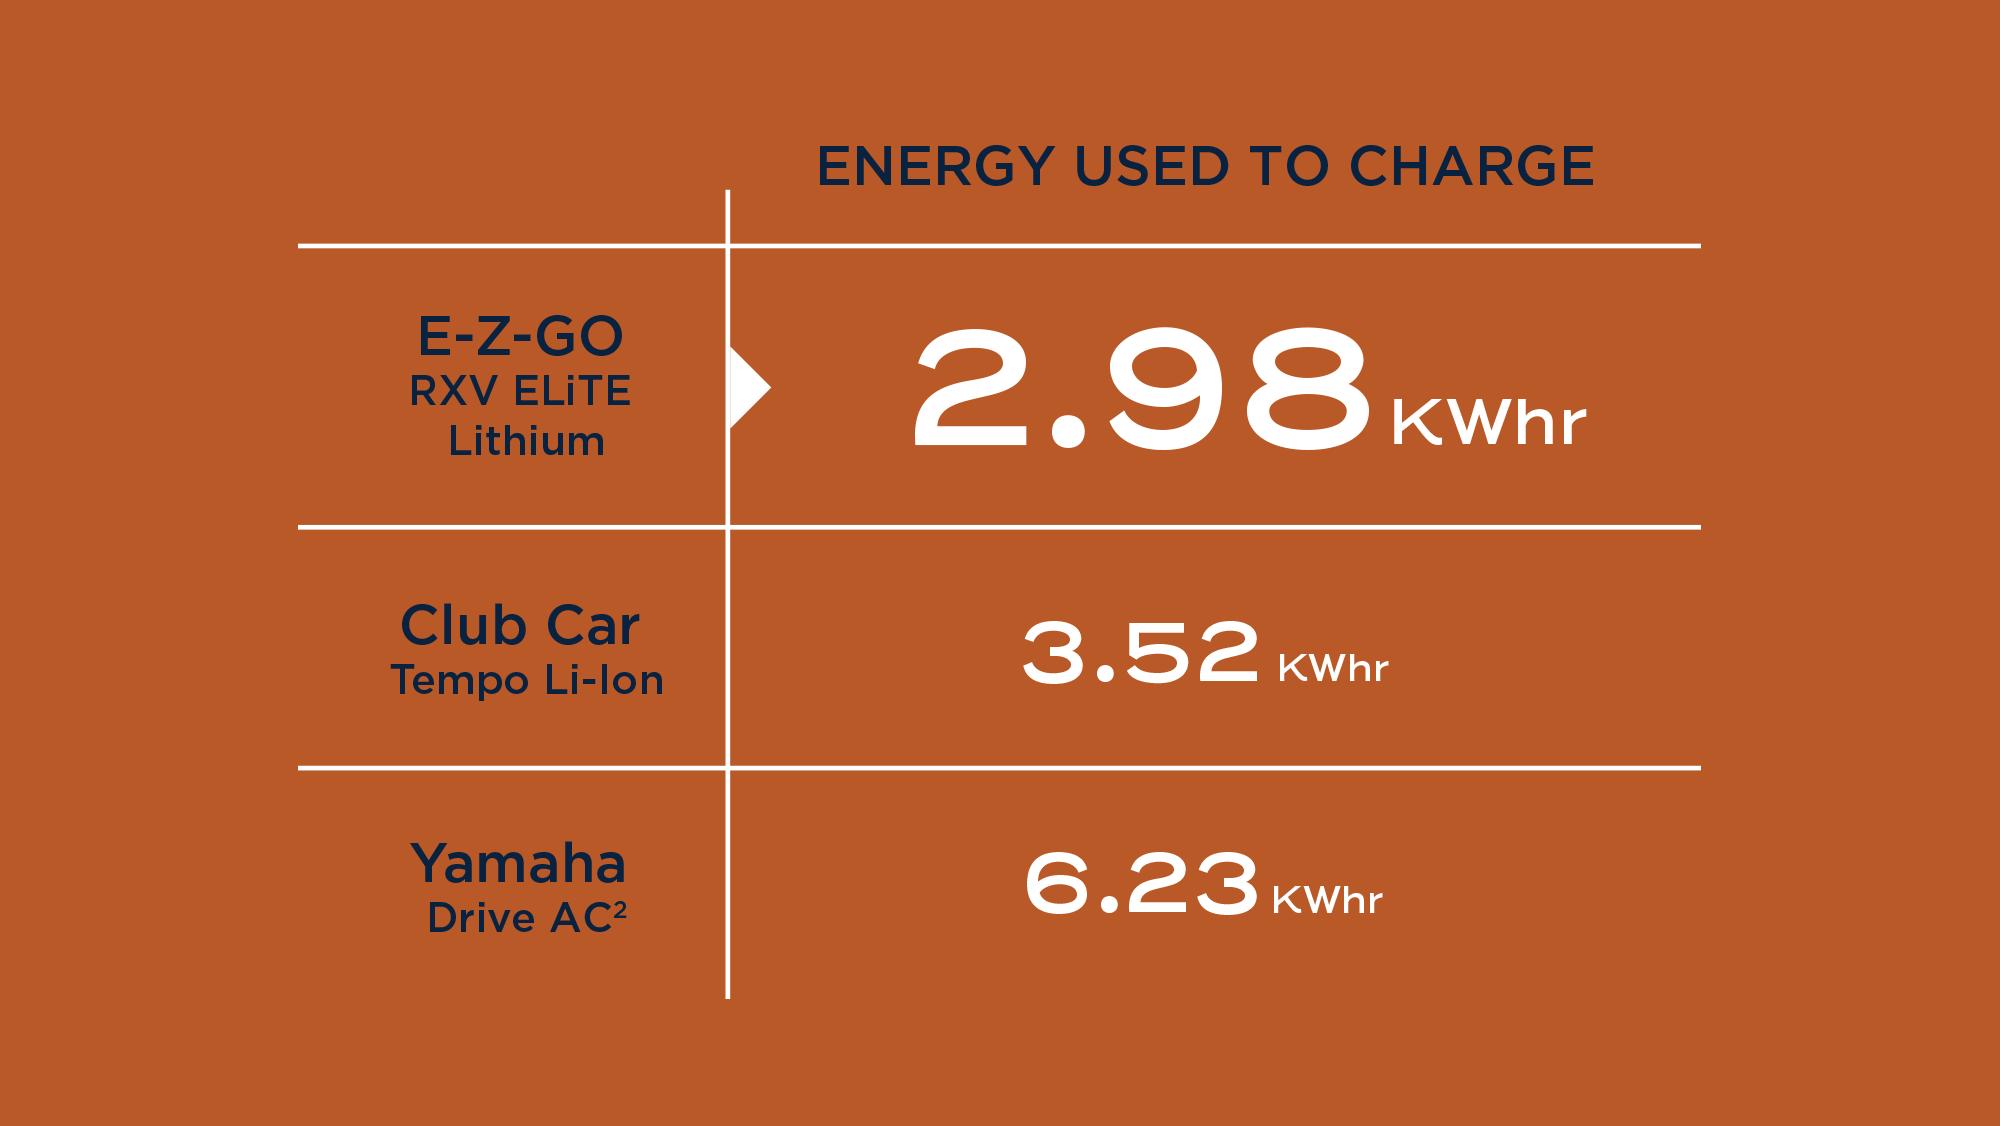 Energy used to charge. E-Z-GO RXV ELiTE Lithium 2.98 KWhr. Club Car Tempo Li-Ion 3.52 KWhr. Yamaha Drive AC 6.23 KWhr.